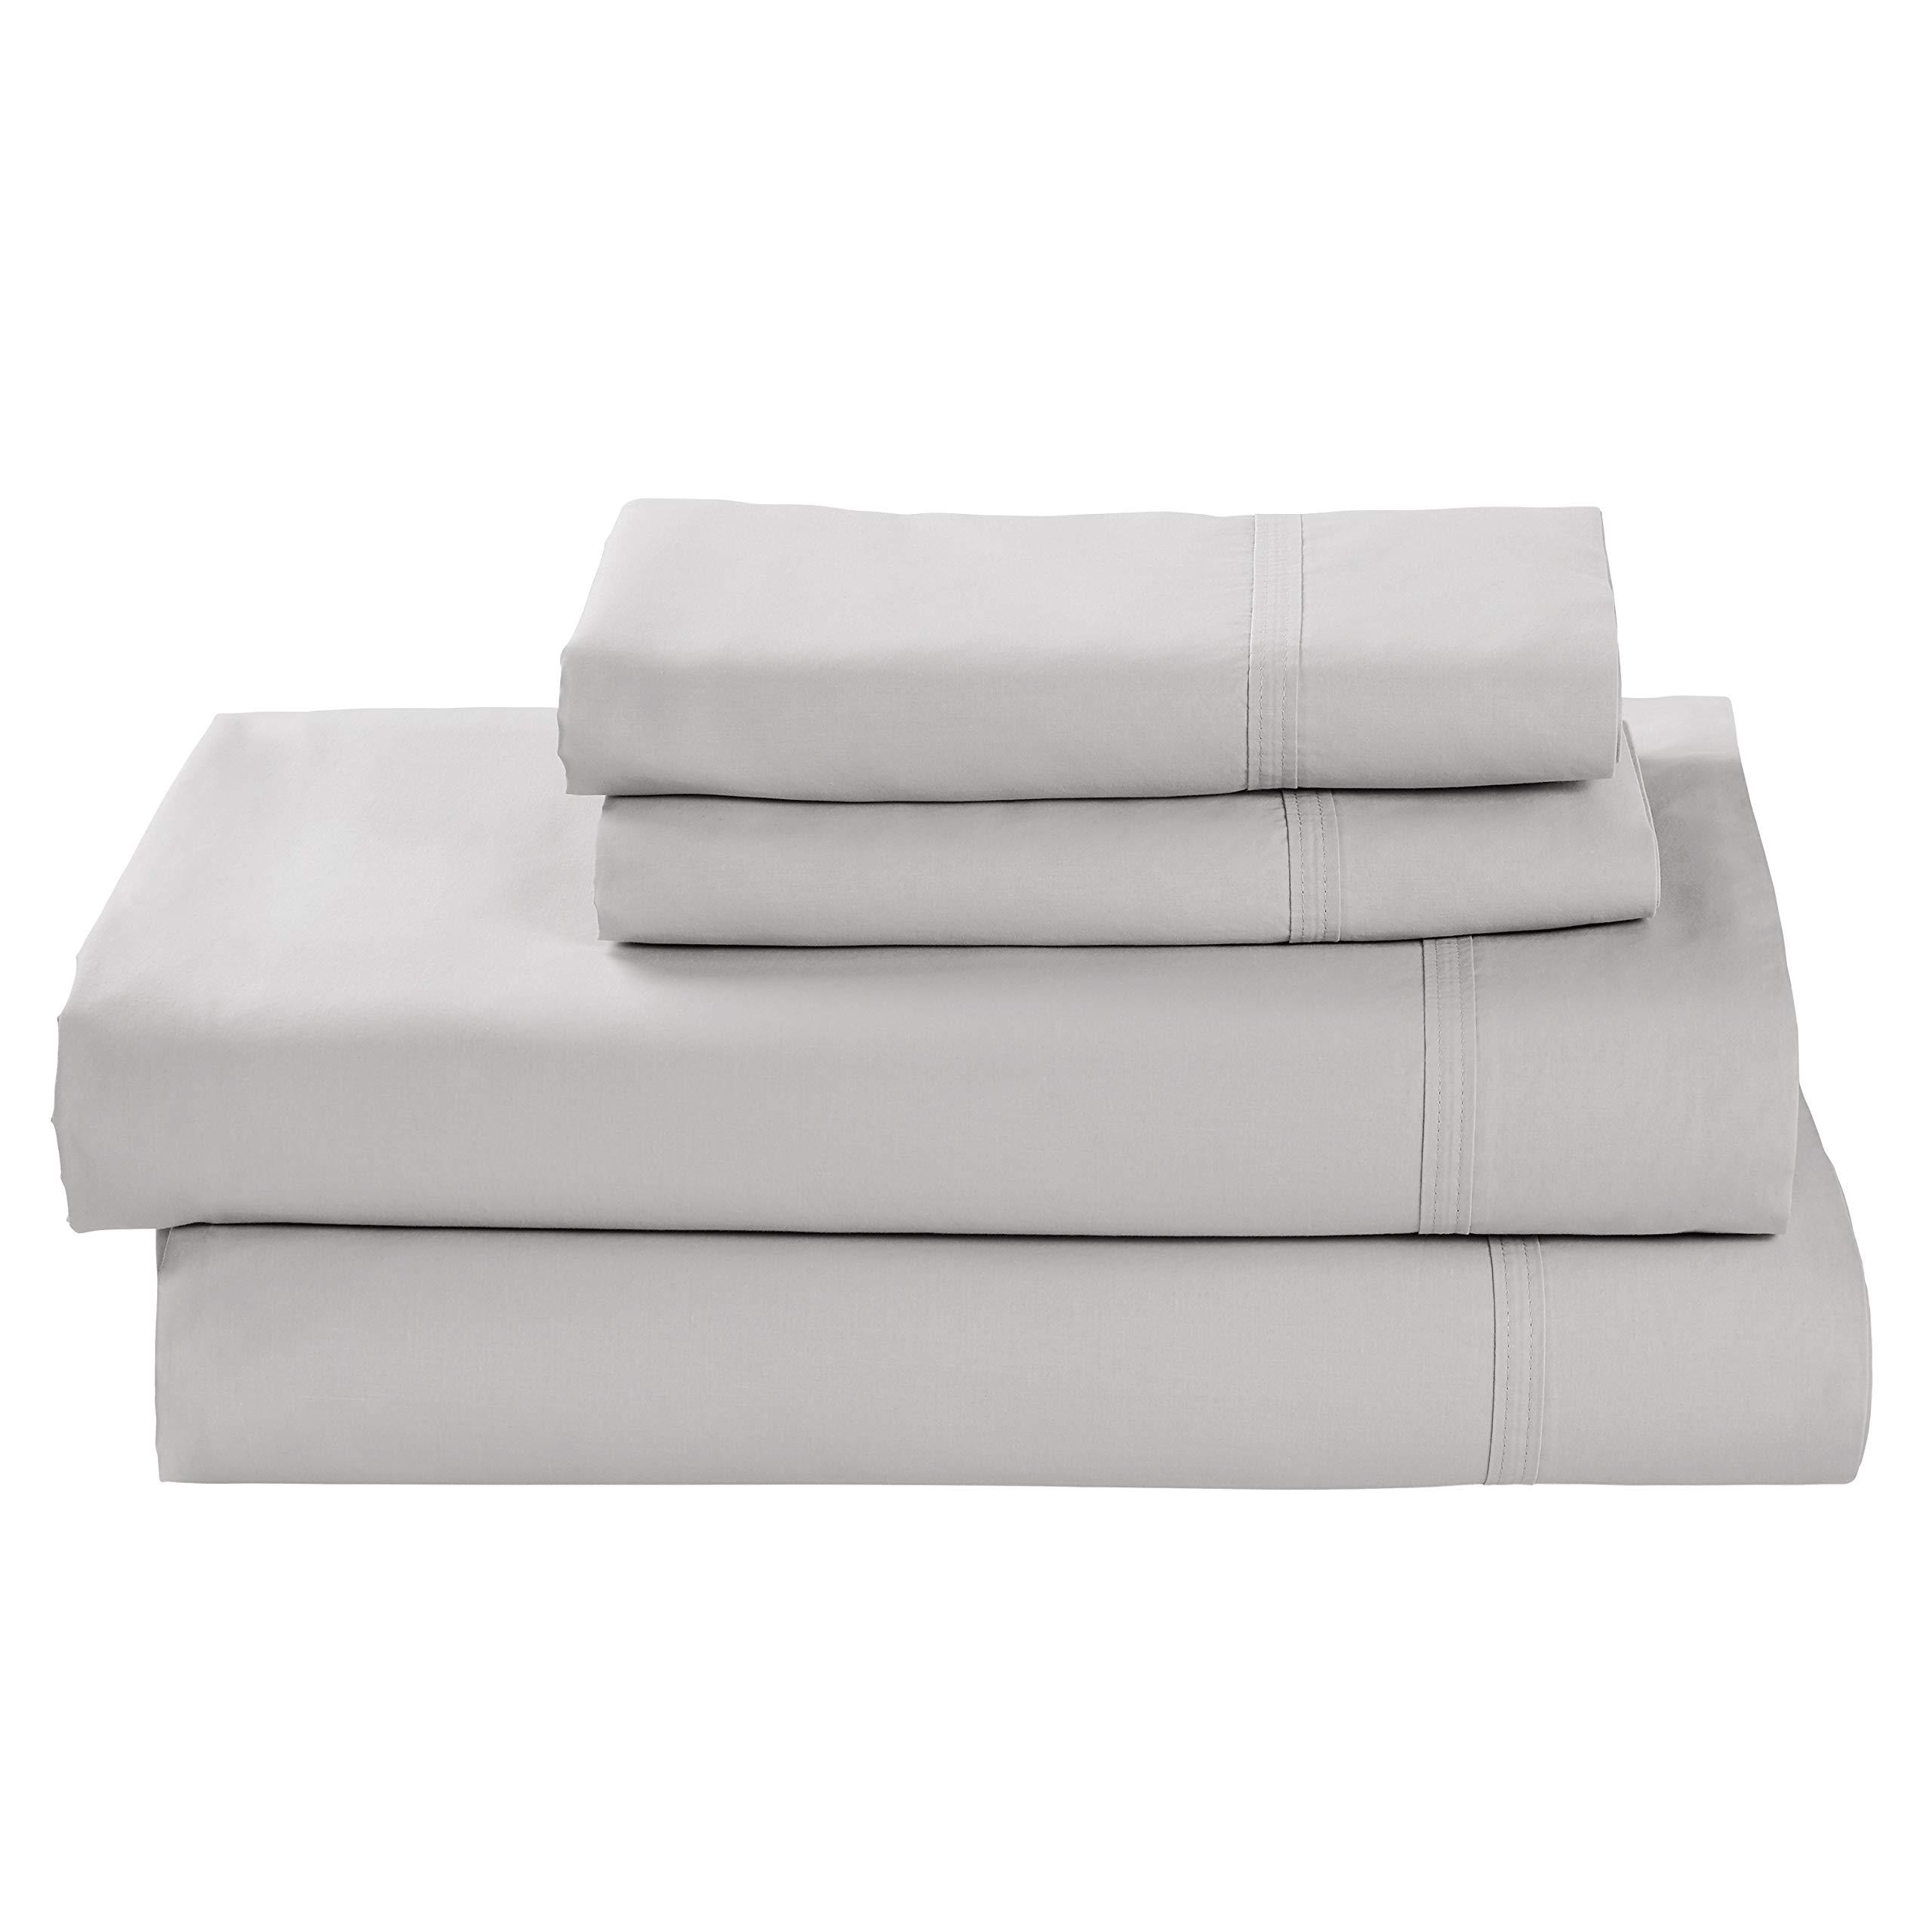 Rivet Percale 100% Organic Cotton Bed Sheet Set, Easy Care, King, Vapor